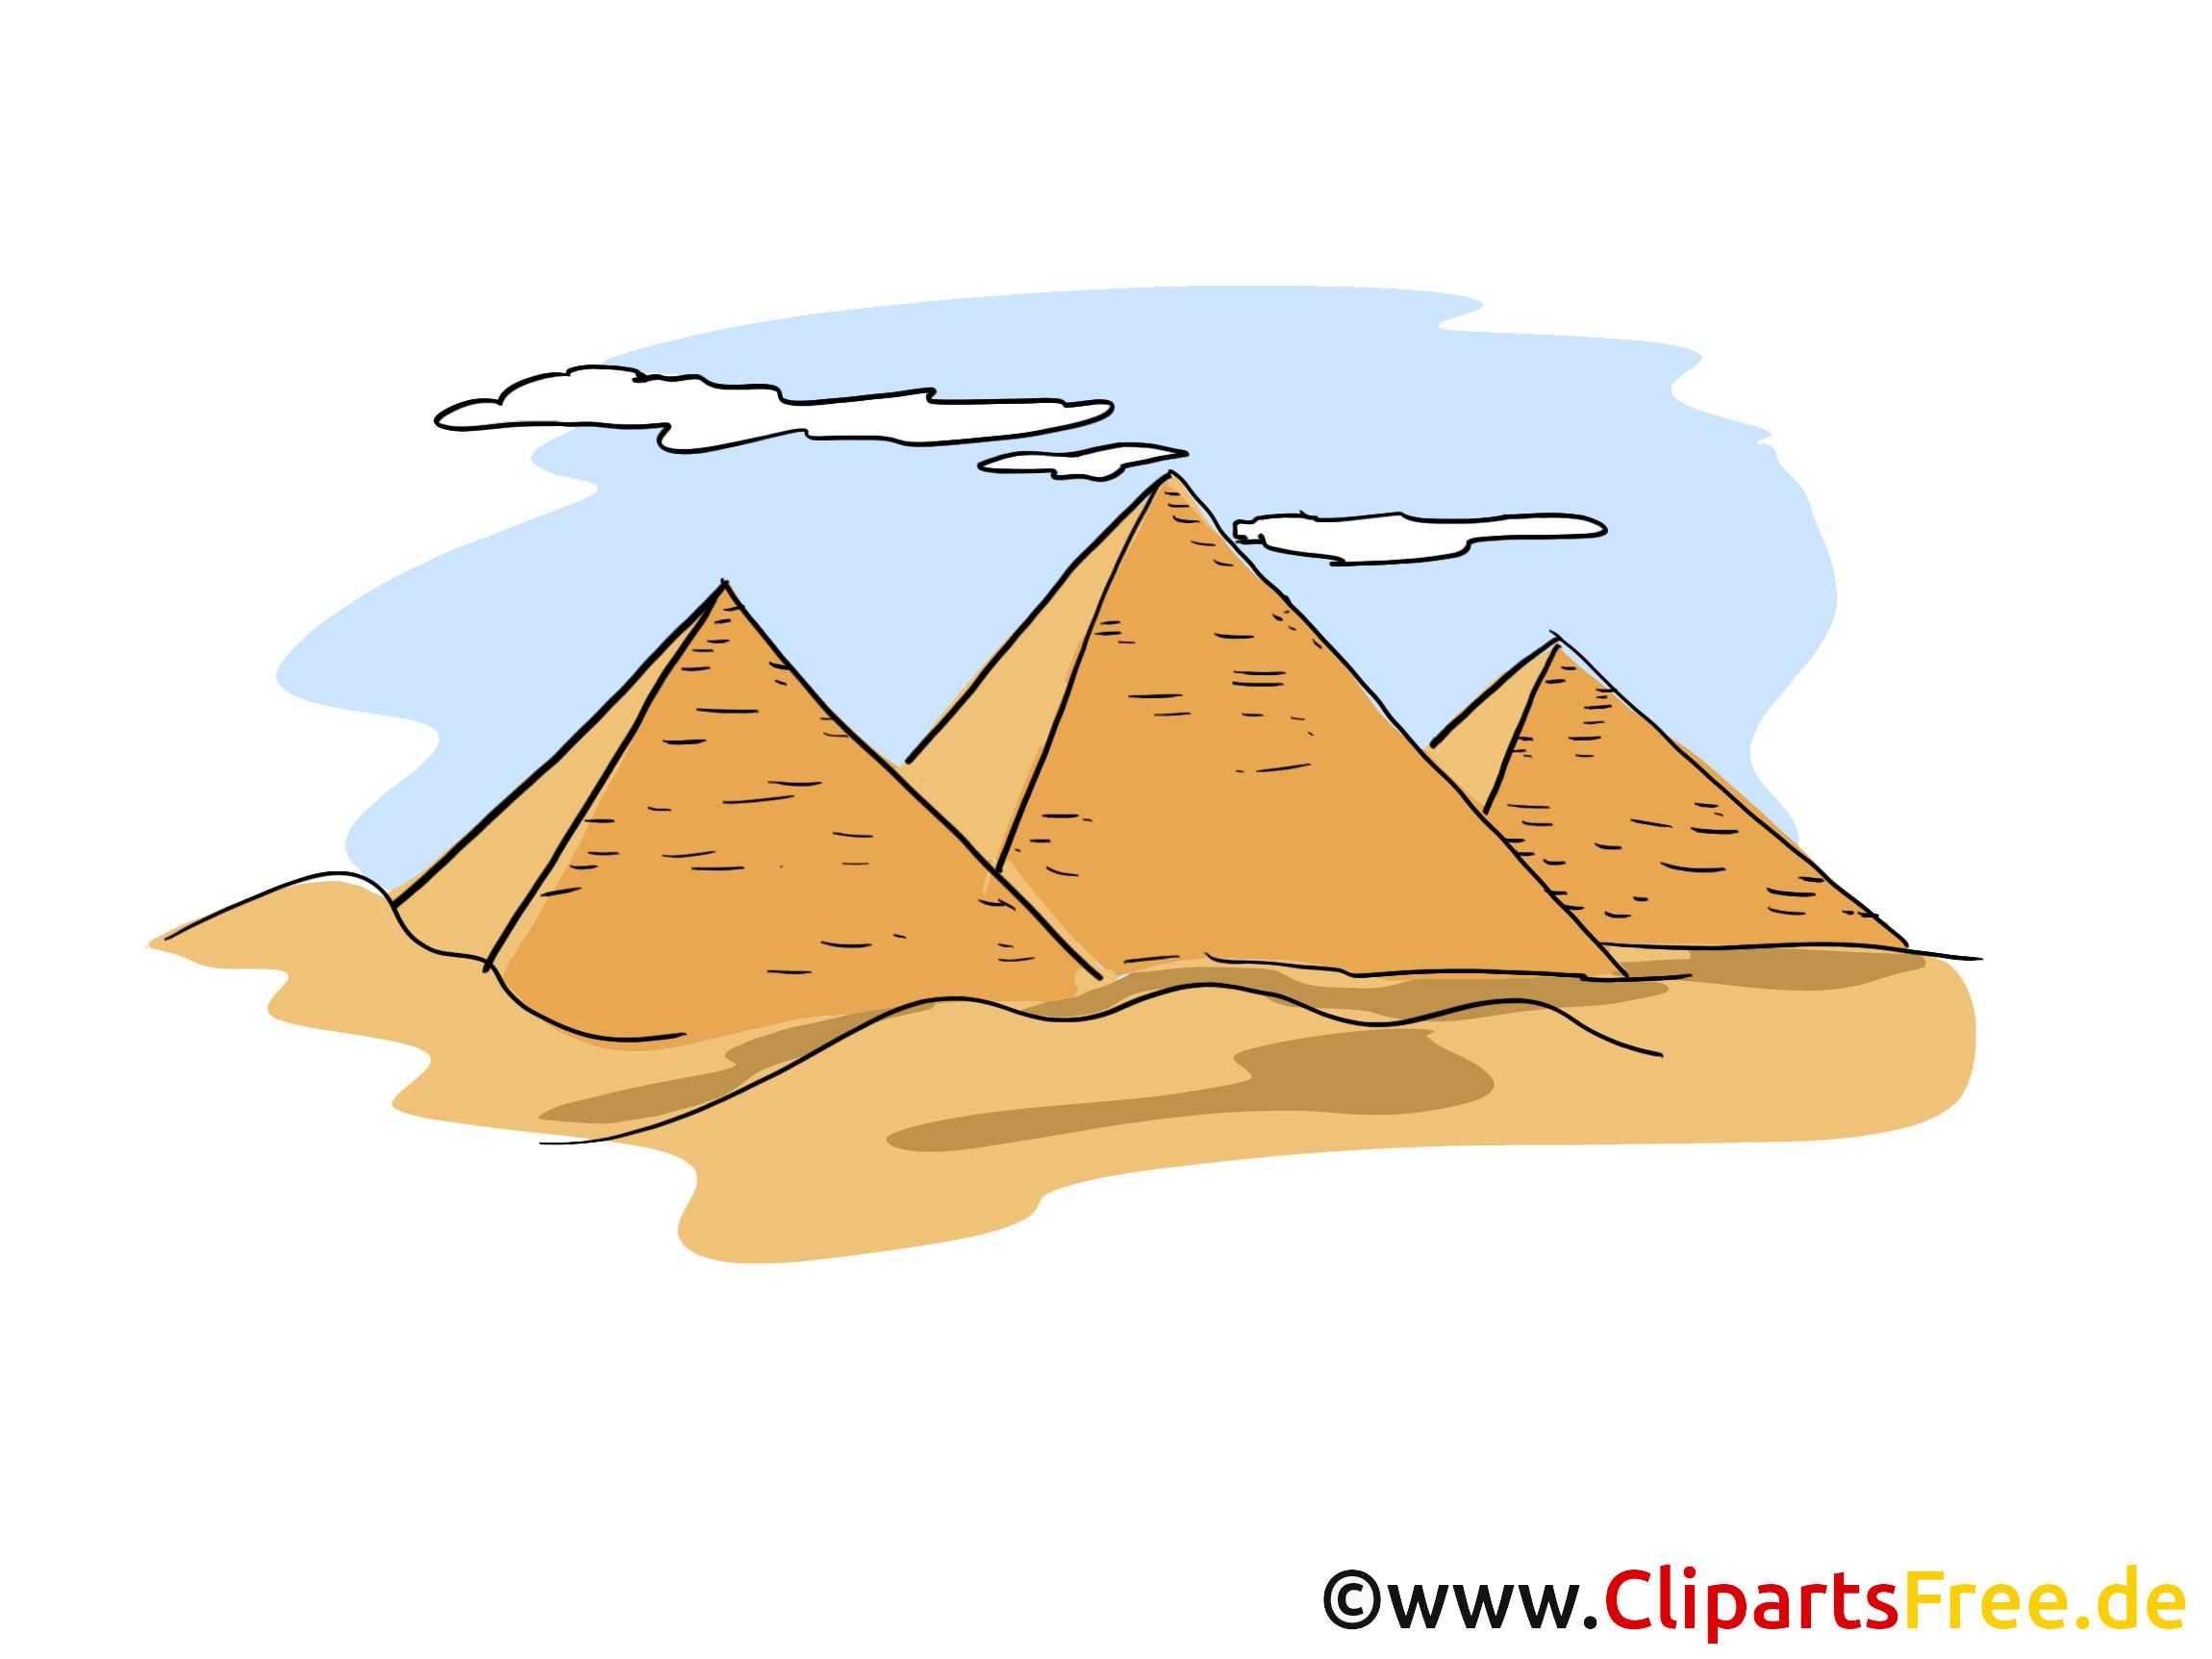 Pyramiden clipart bild cartoon - Dessin de pyramide ...